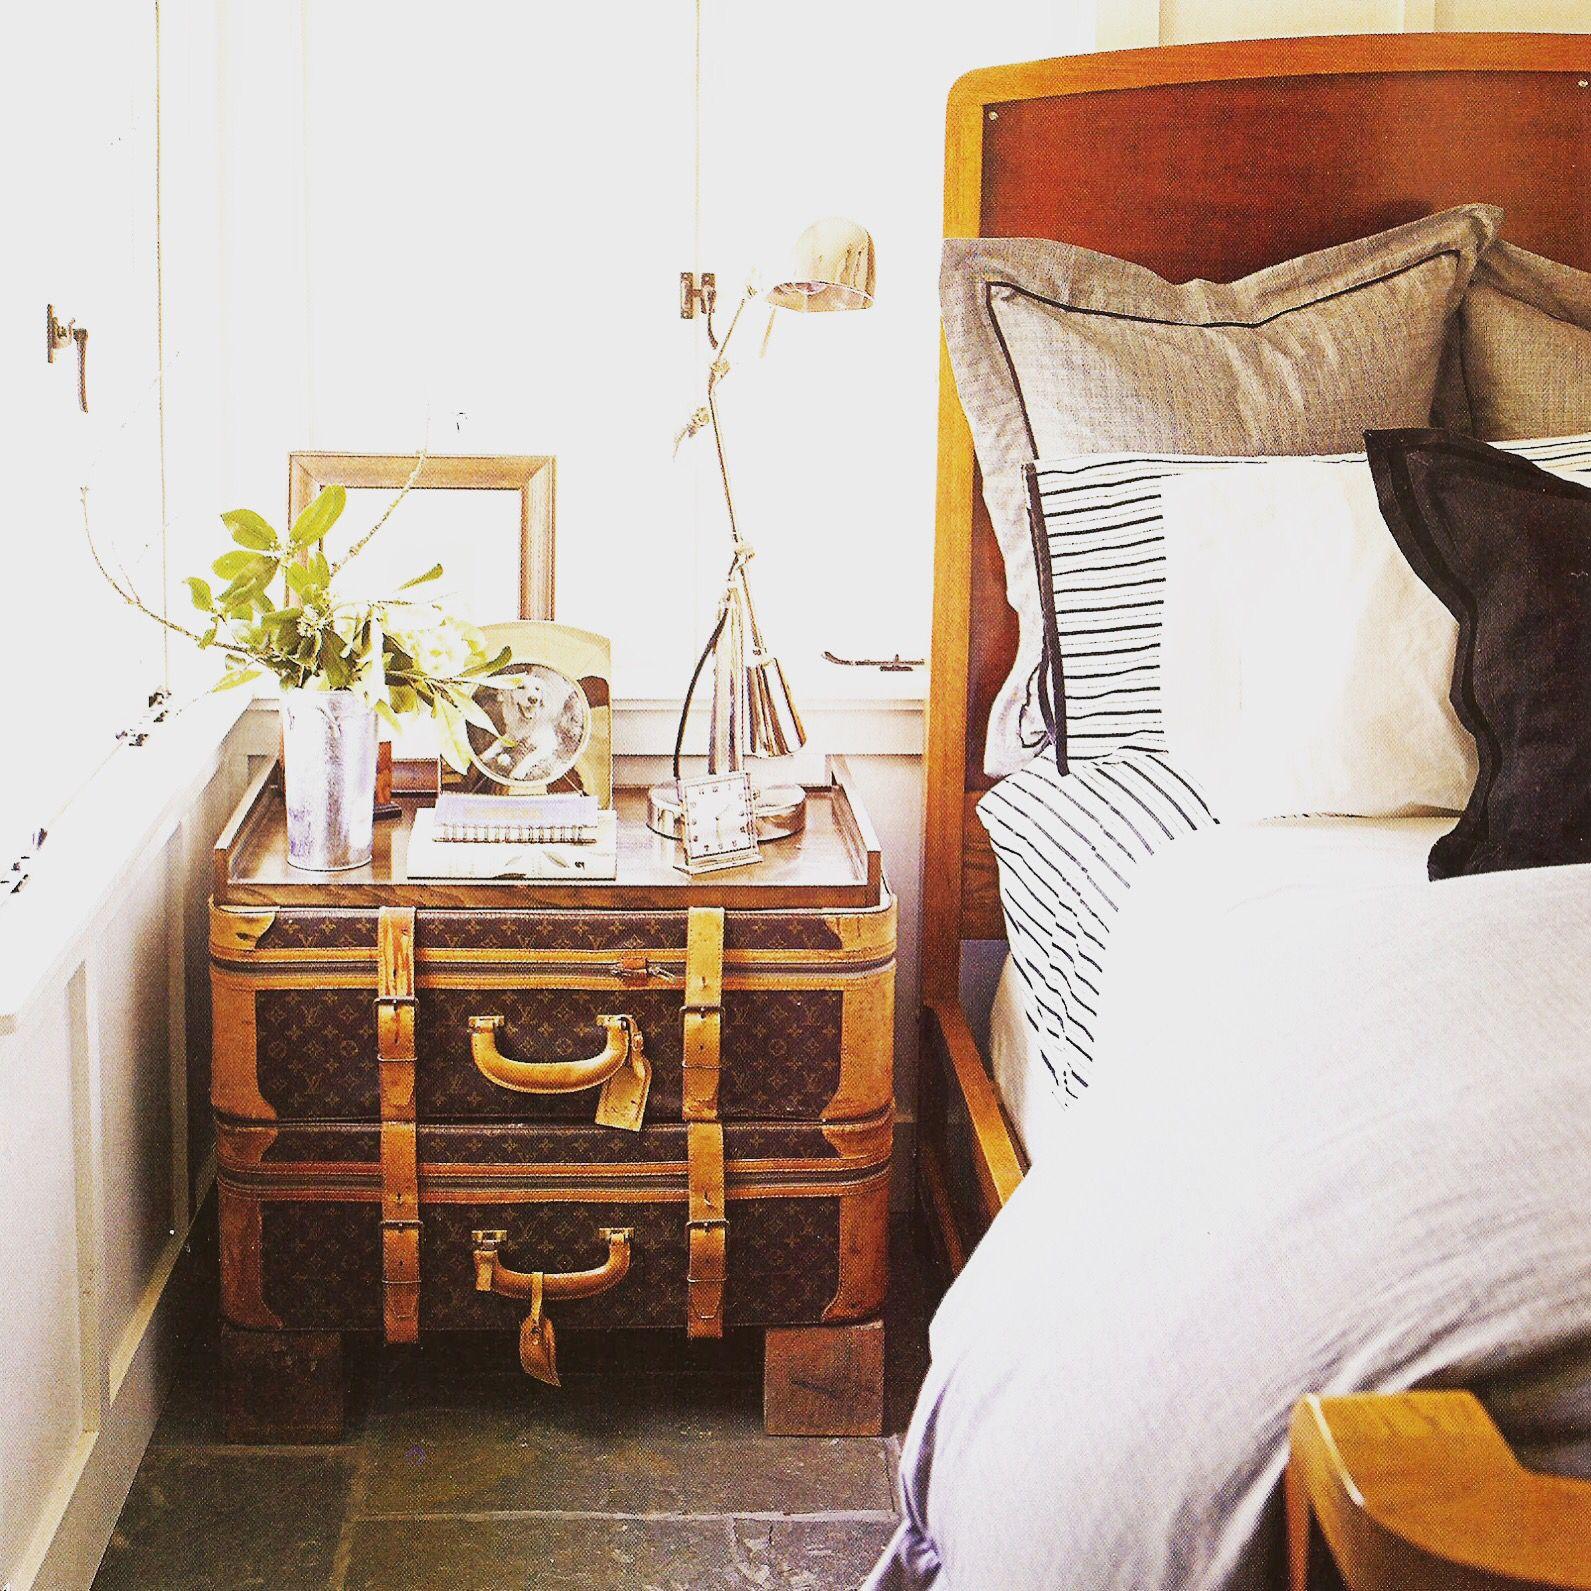 Louie nightstand